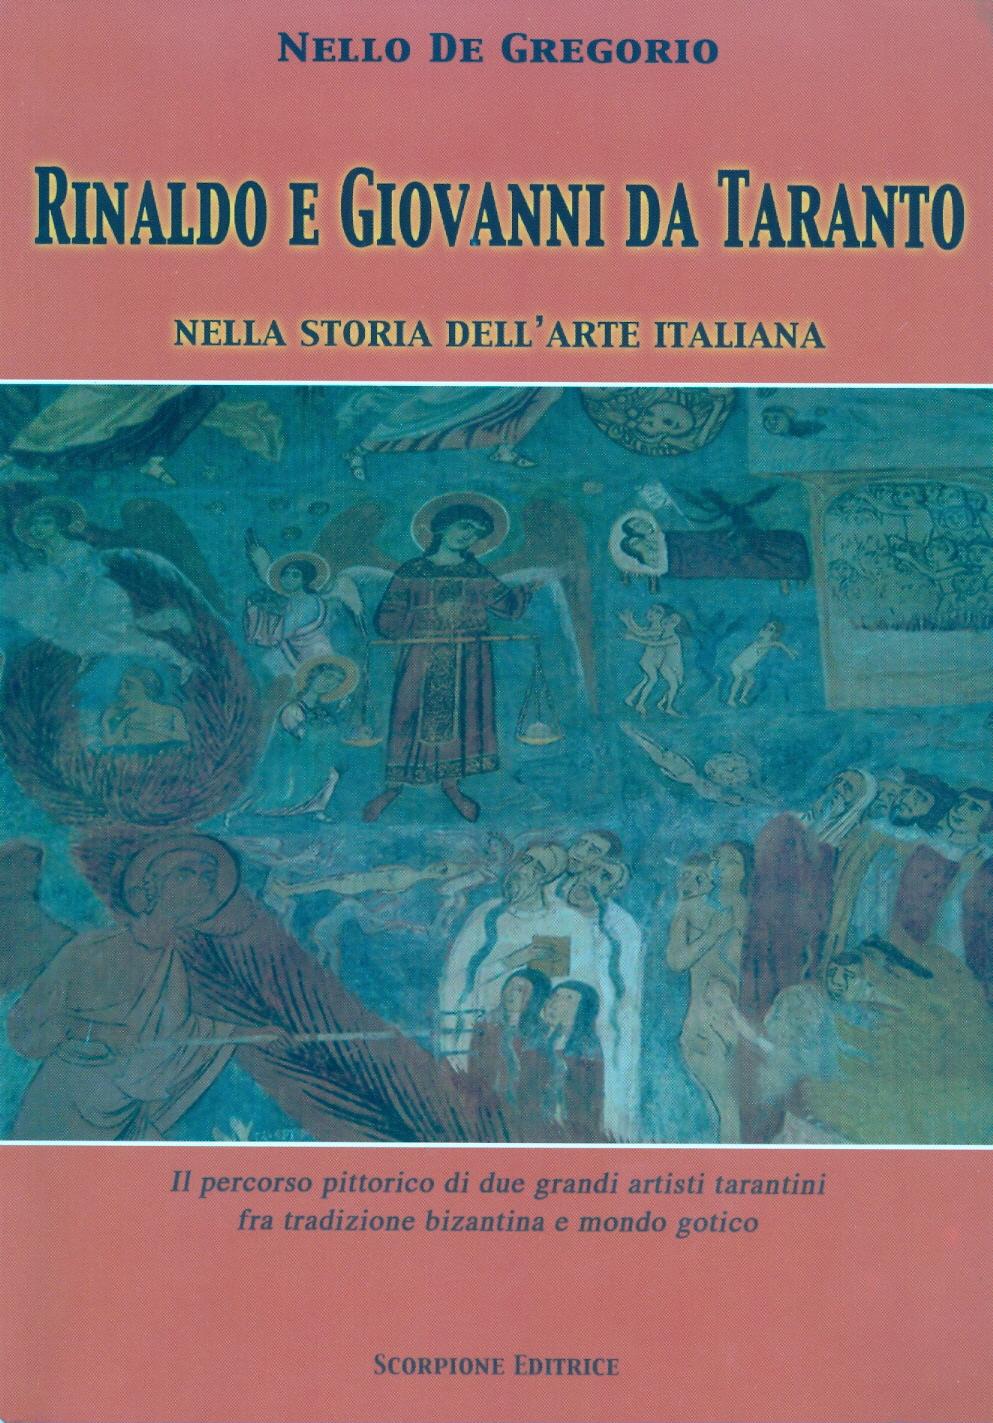 Rinaldo e Giovanni da Taranto